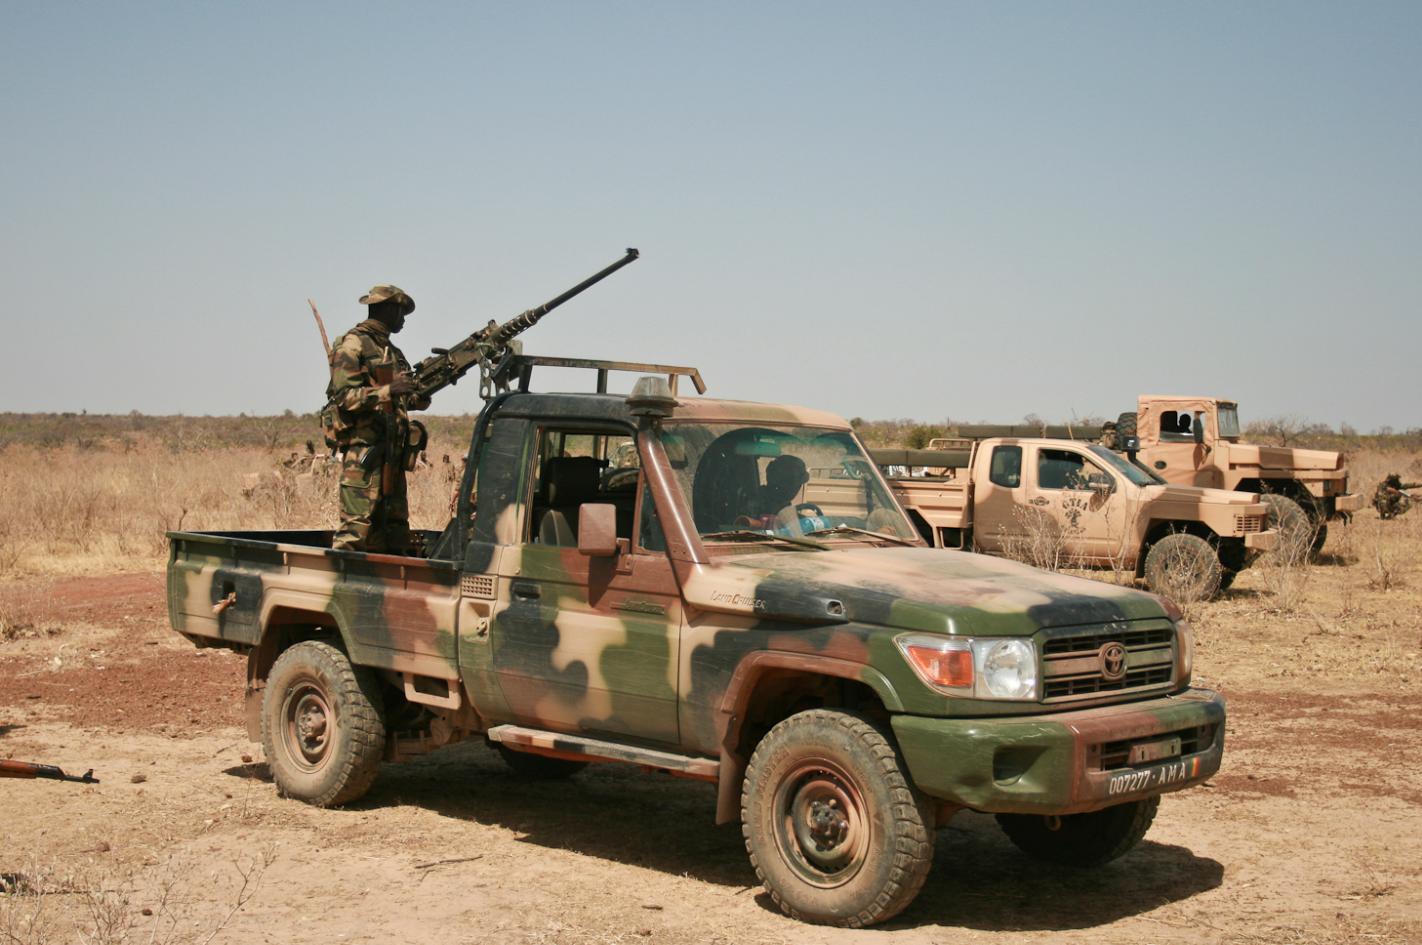 fob forces operations blogla transformation de l 39 arm e malienne fob forces operations blog. Black Bedroom Furniture Sets. Home Design Ideas